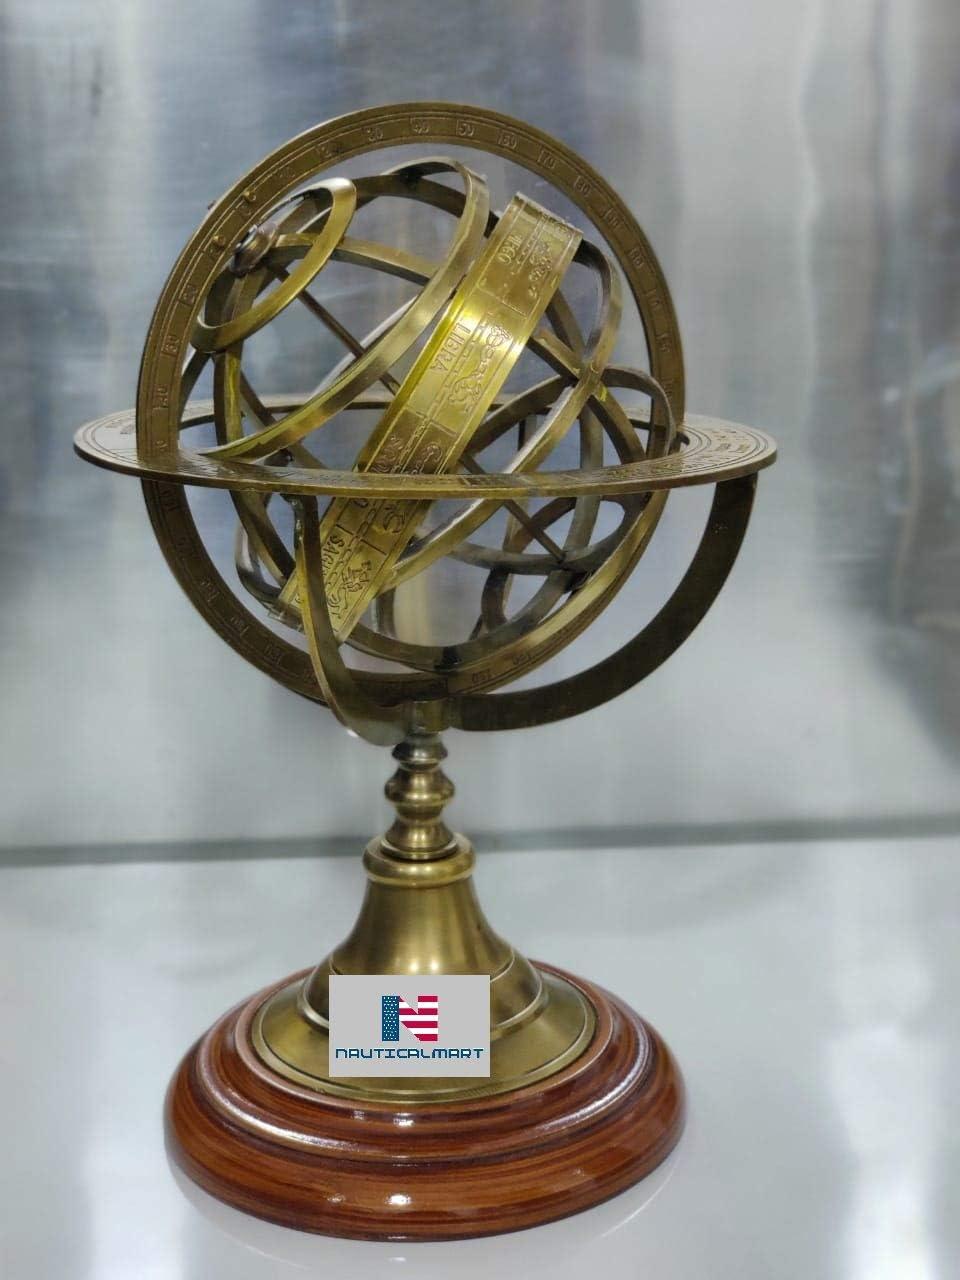 "Nautical-Mart Antique Vintage Armillary Brass Sphere Globe Wooden Display | Pirate's Antique Ship Decor (11"")"